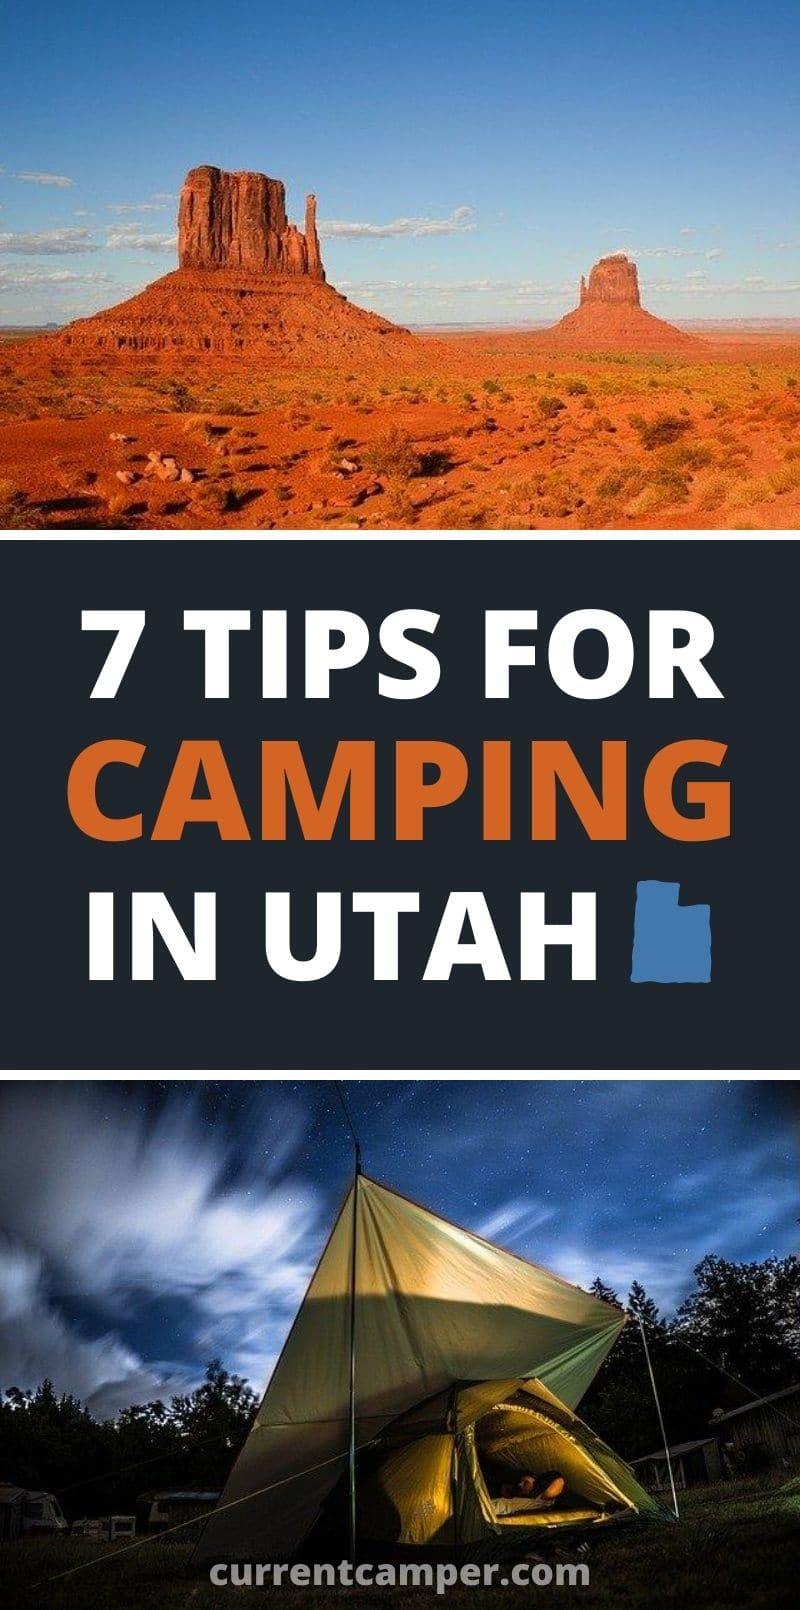 7 tips for camping in utah Pinterest image